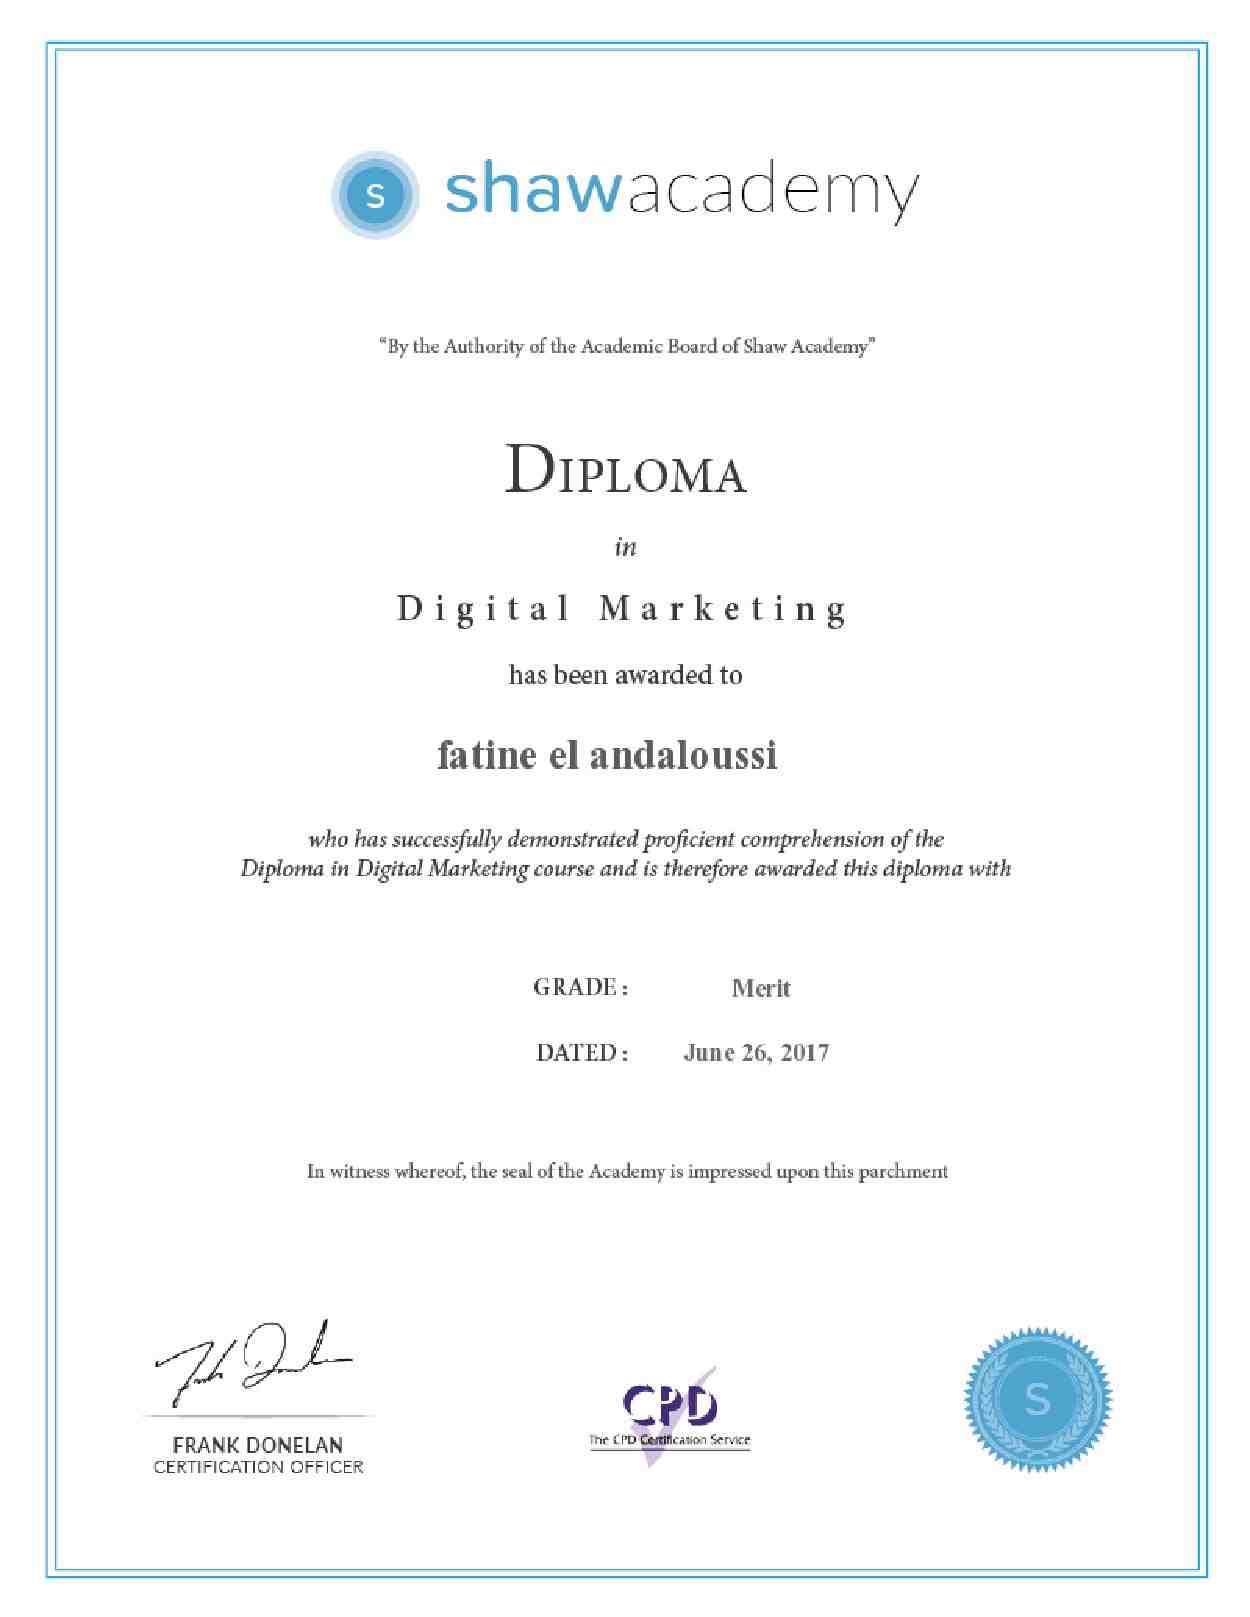 Fatine el andaloussi bayt digital marketing certificate xflitez Choice Image